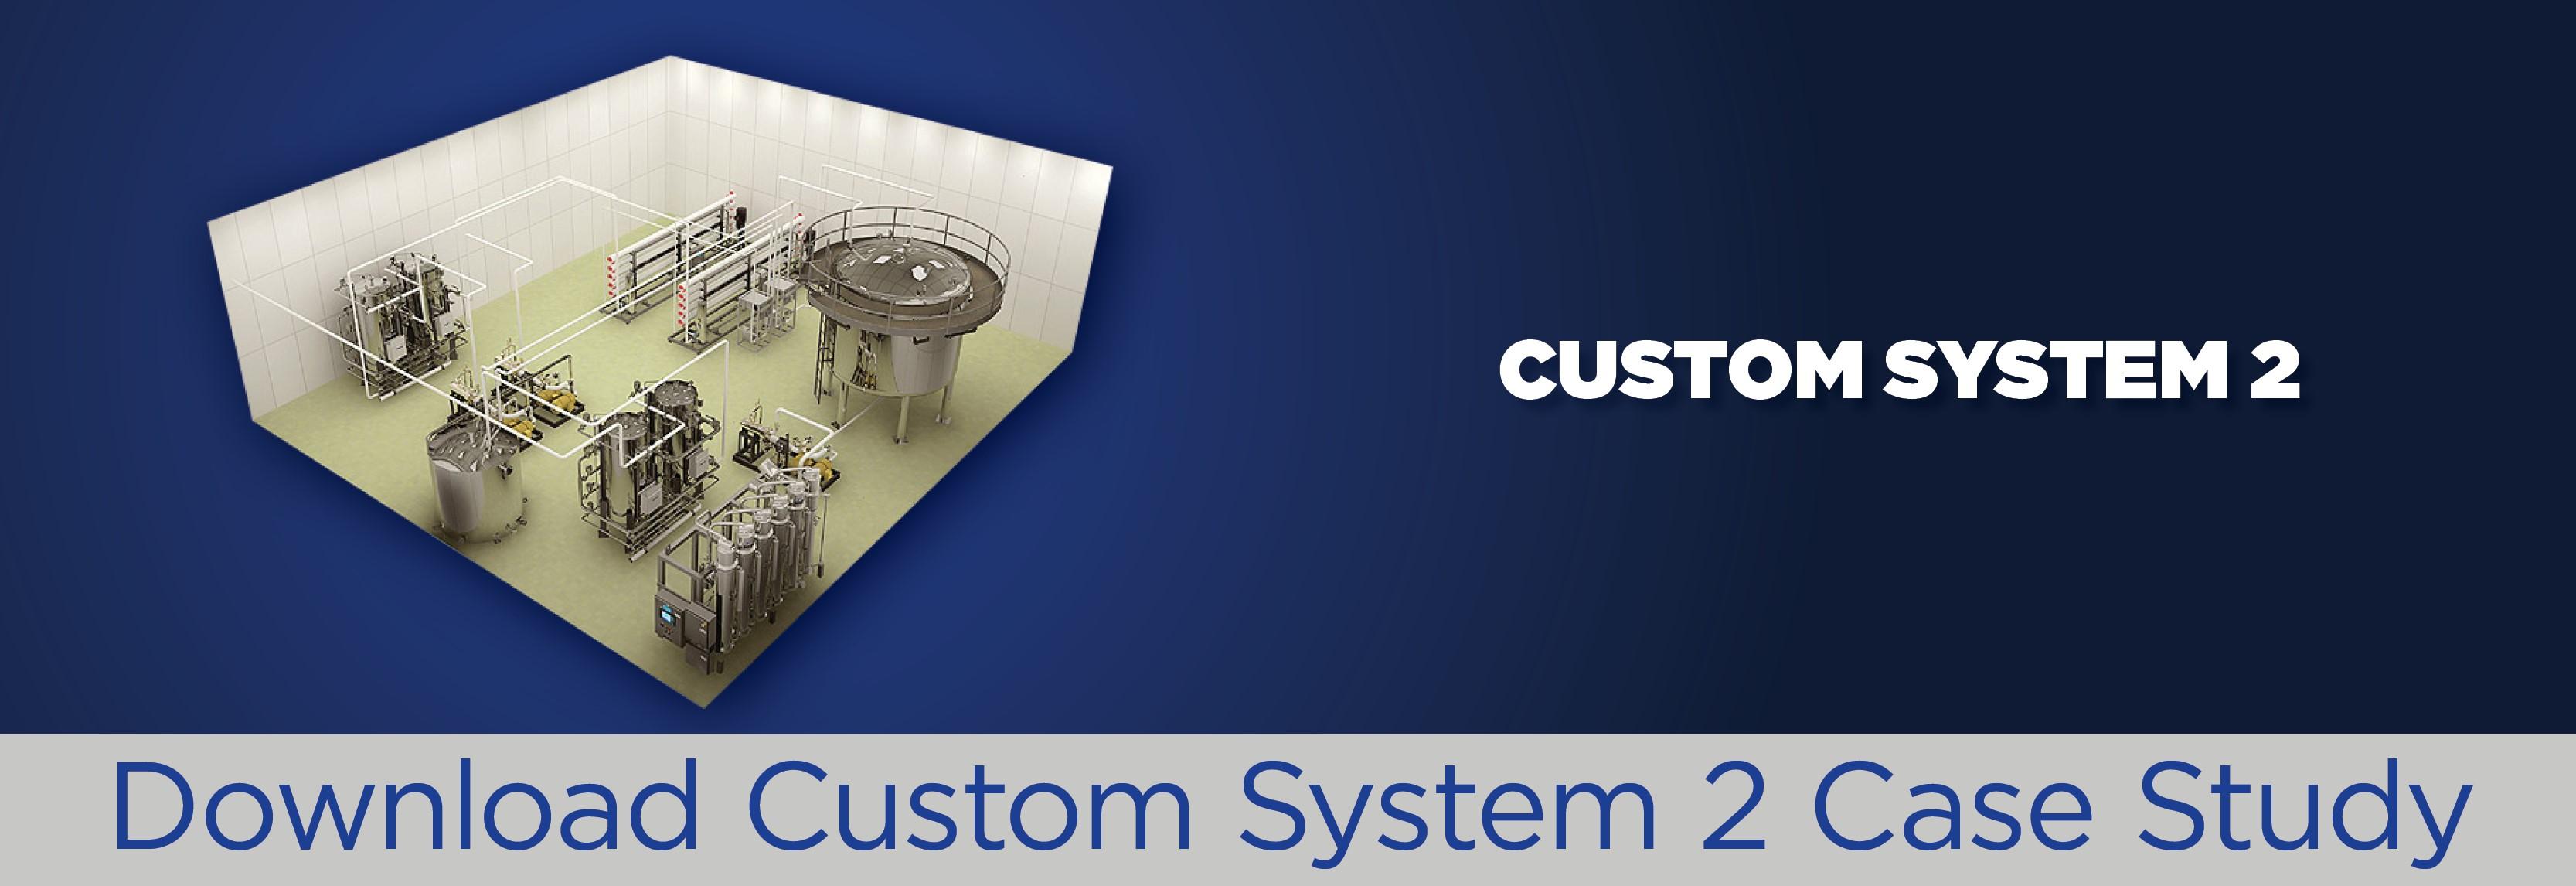 Lander Banner_Customer System 2_Case Study.jpg